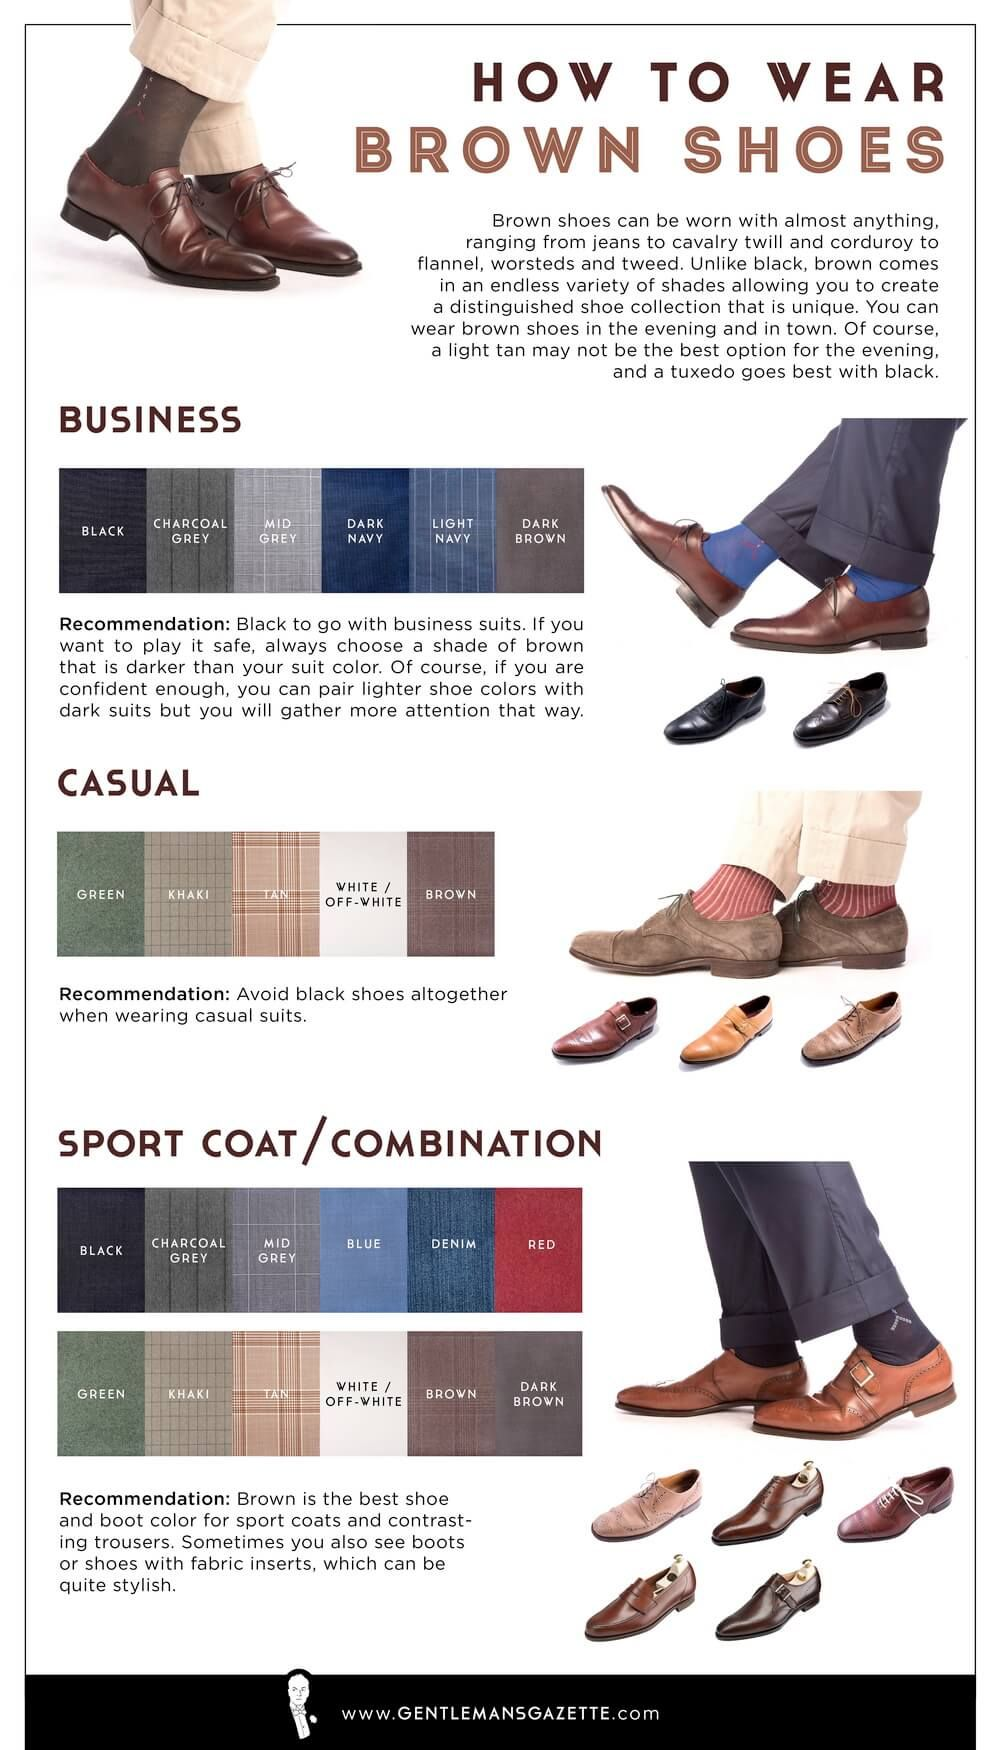 How to wear brown shoes #Men's #MensFashion #Fashion